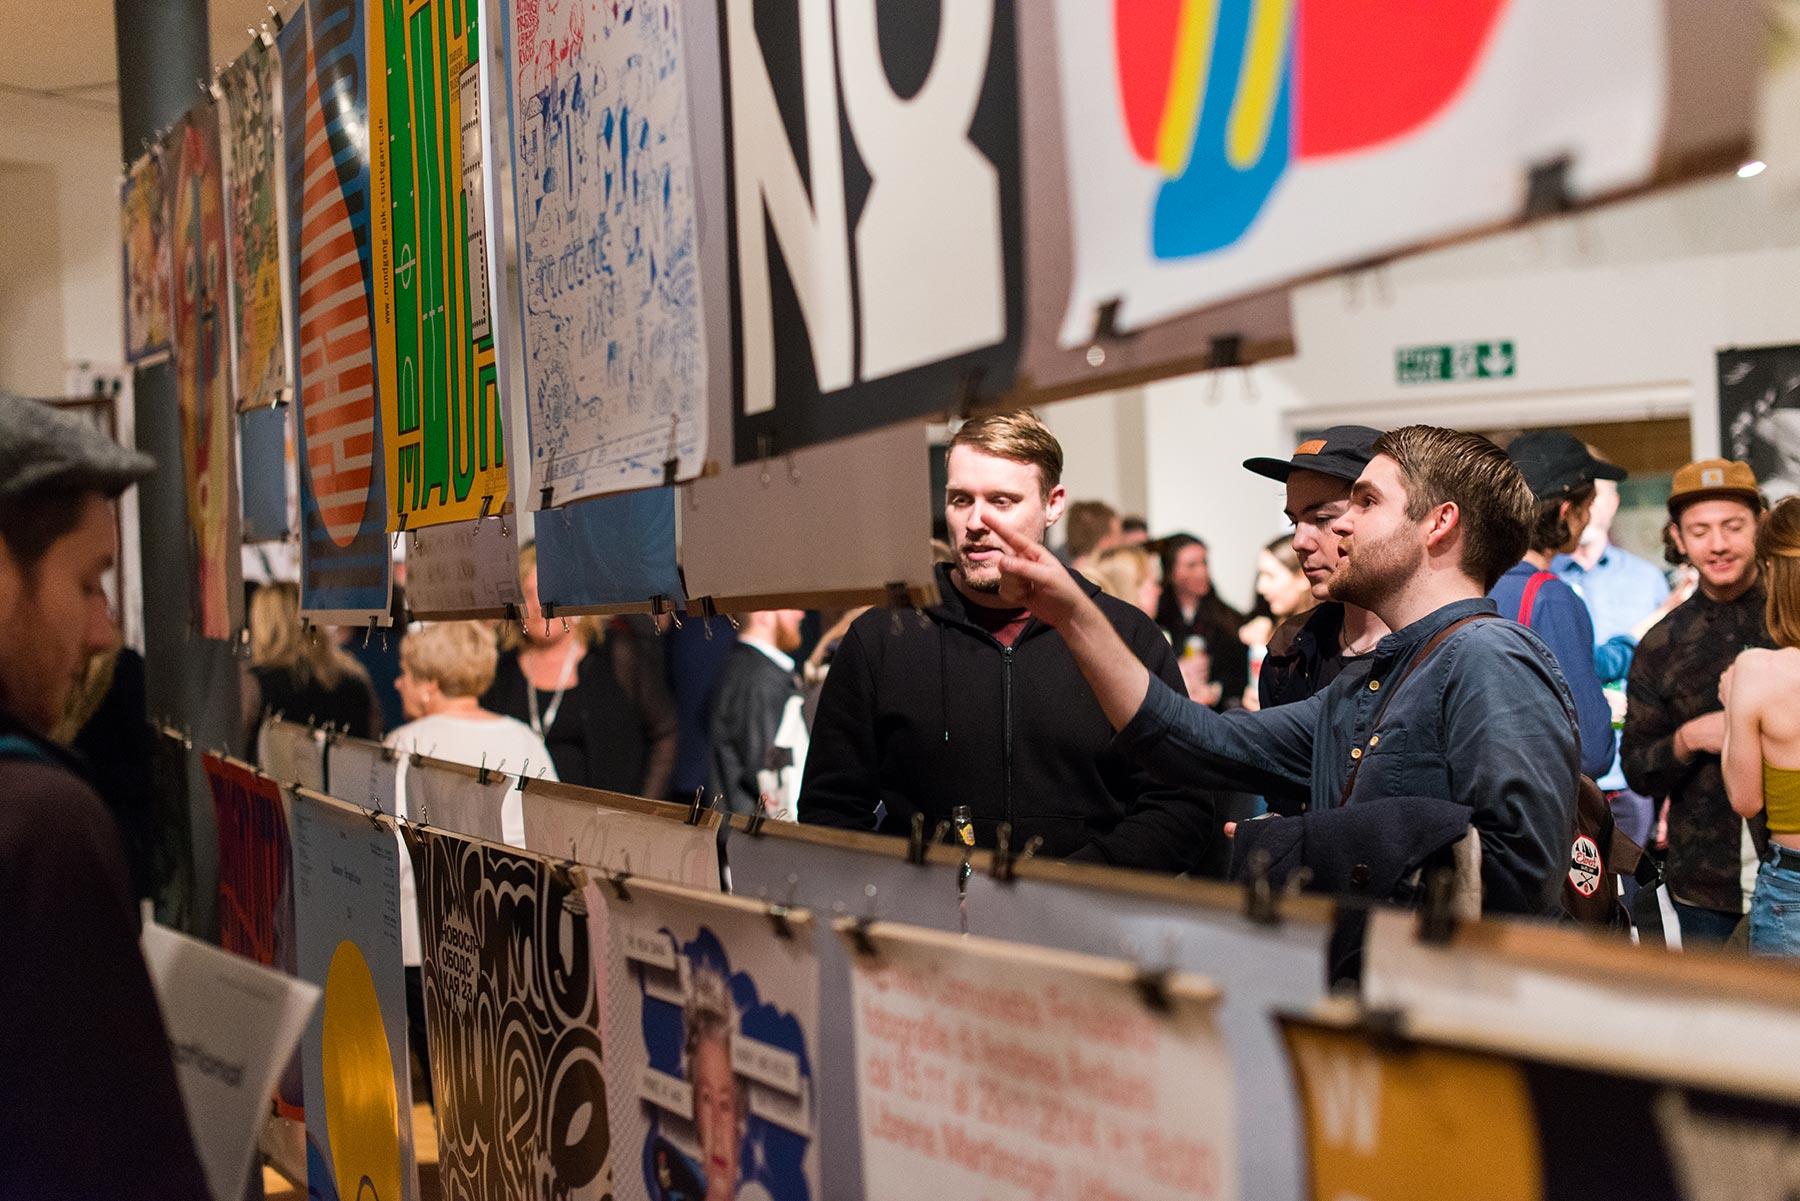 6graphicdesignfestivalscotland-2015-launch